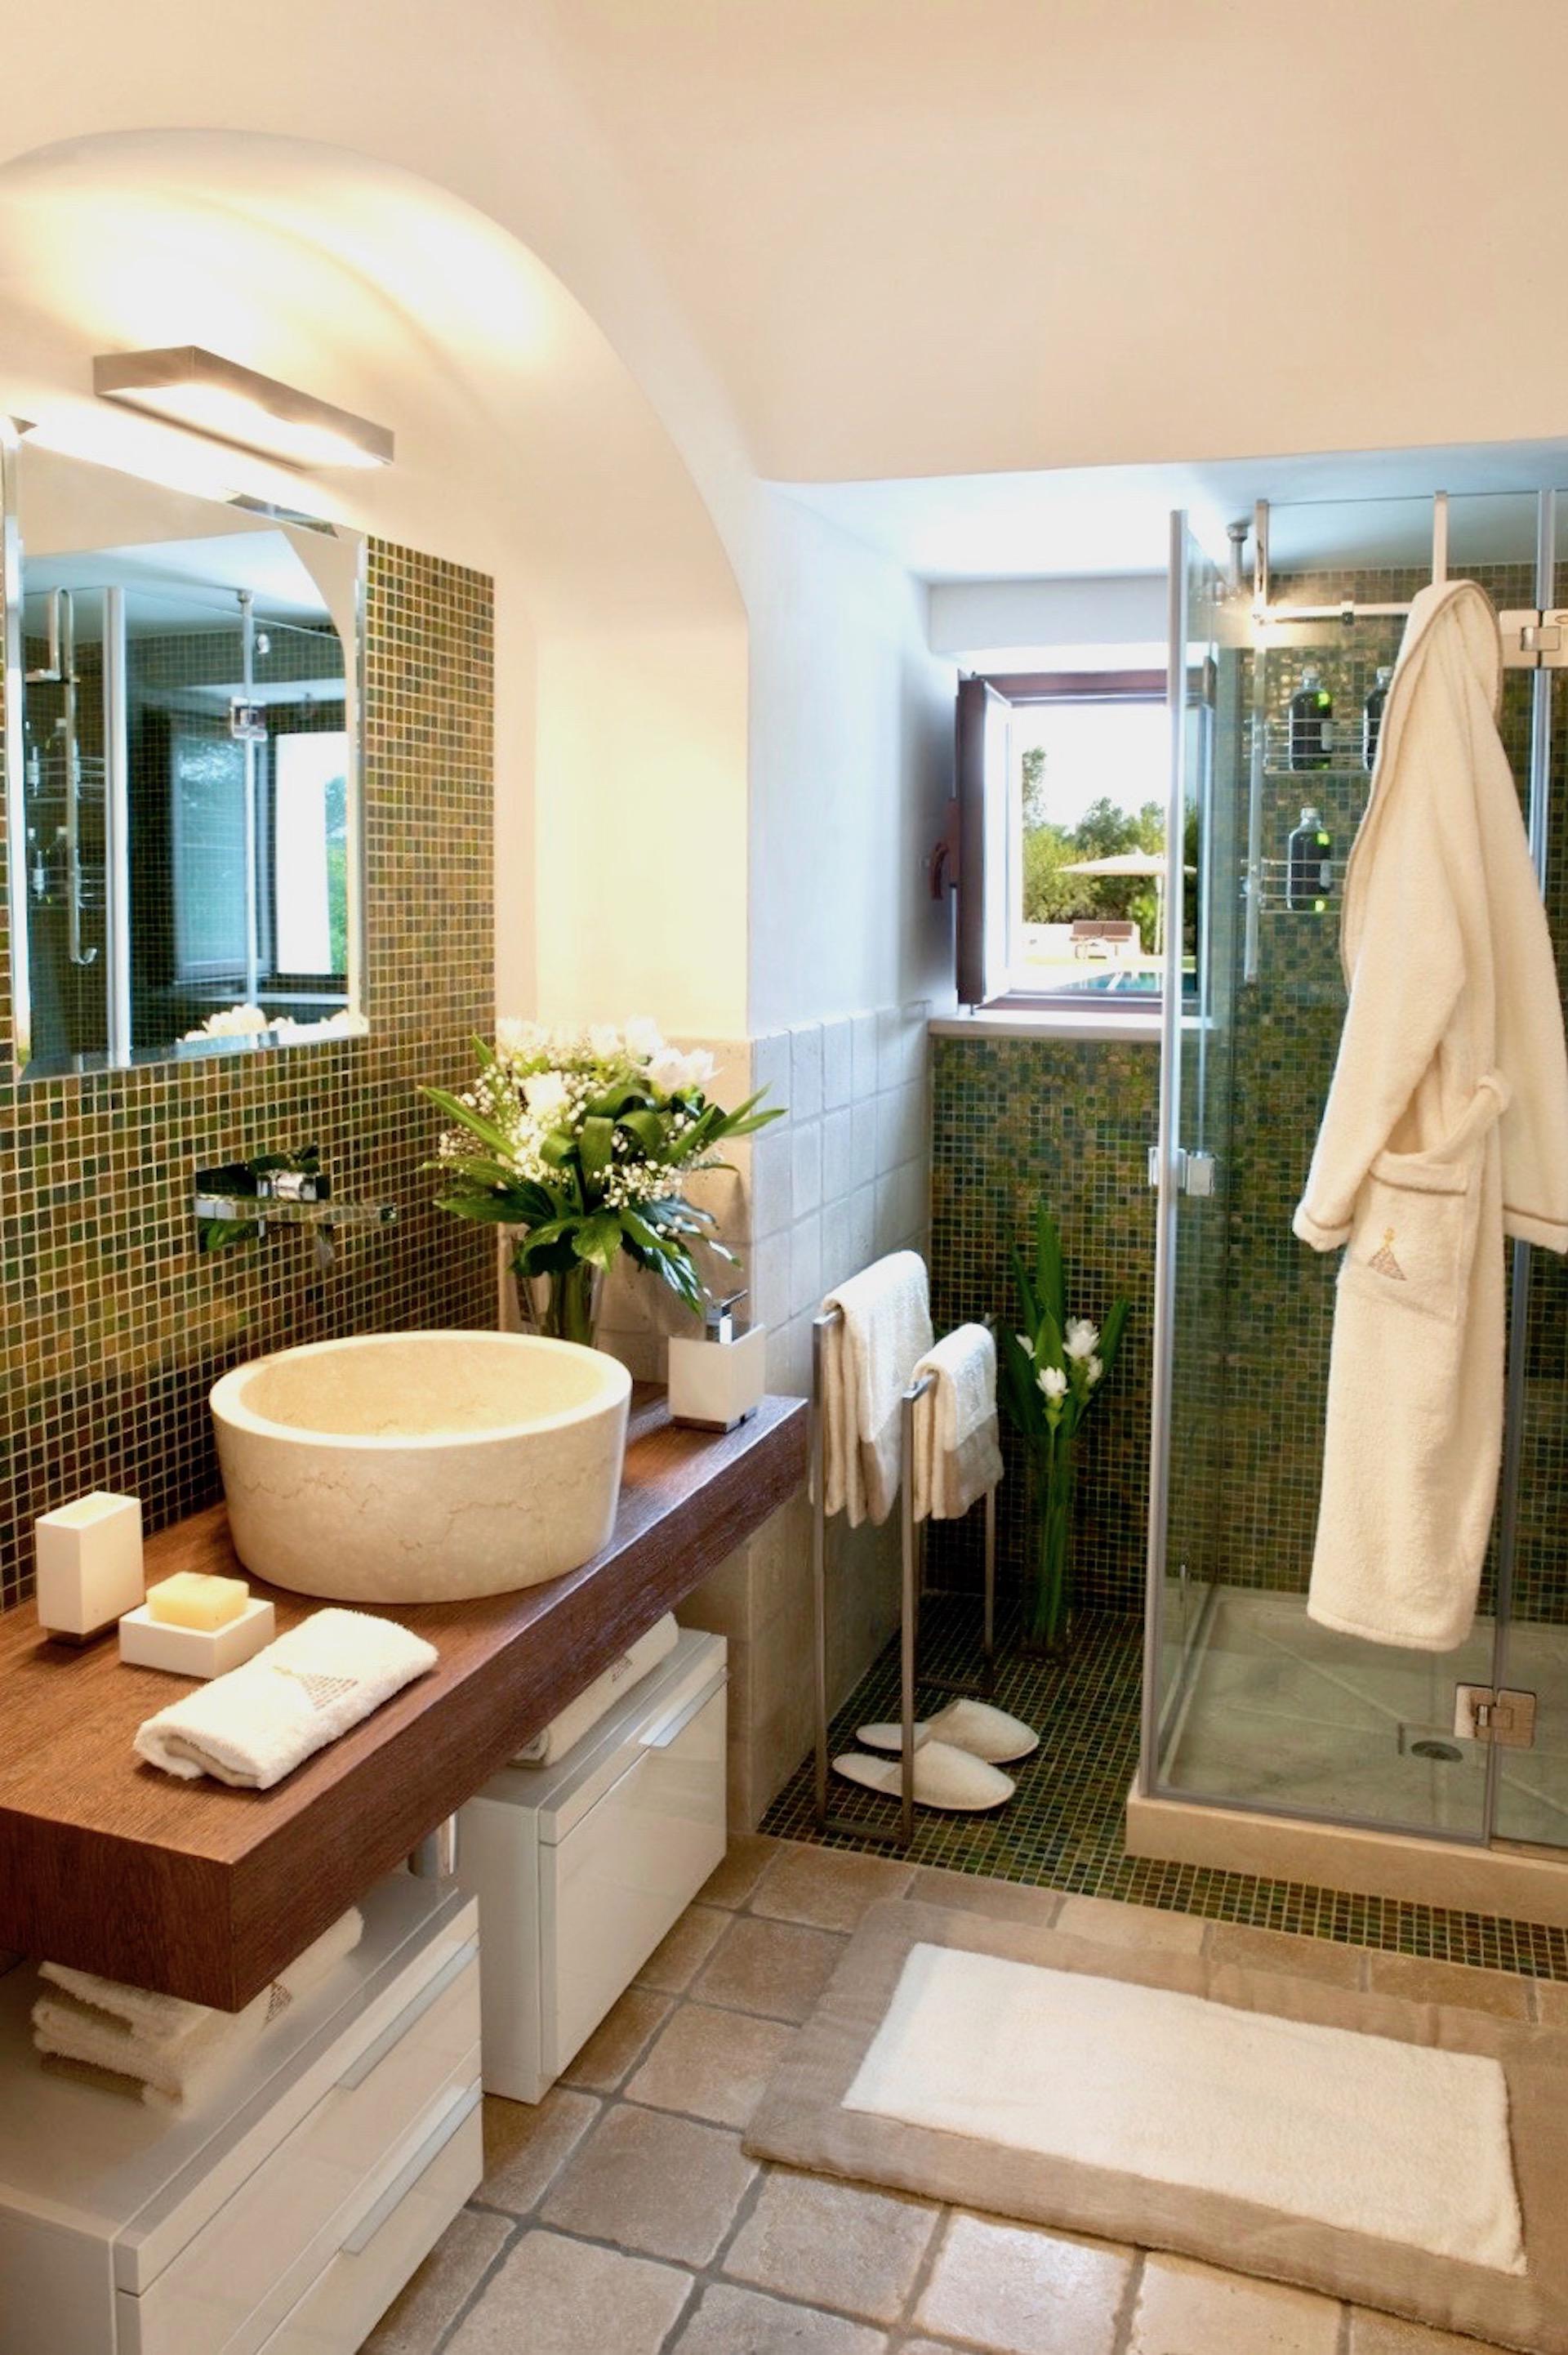 Bathroom F3I6222 Copia 2